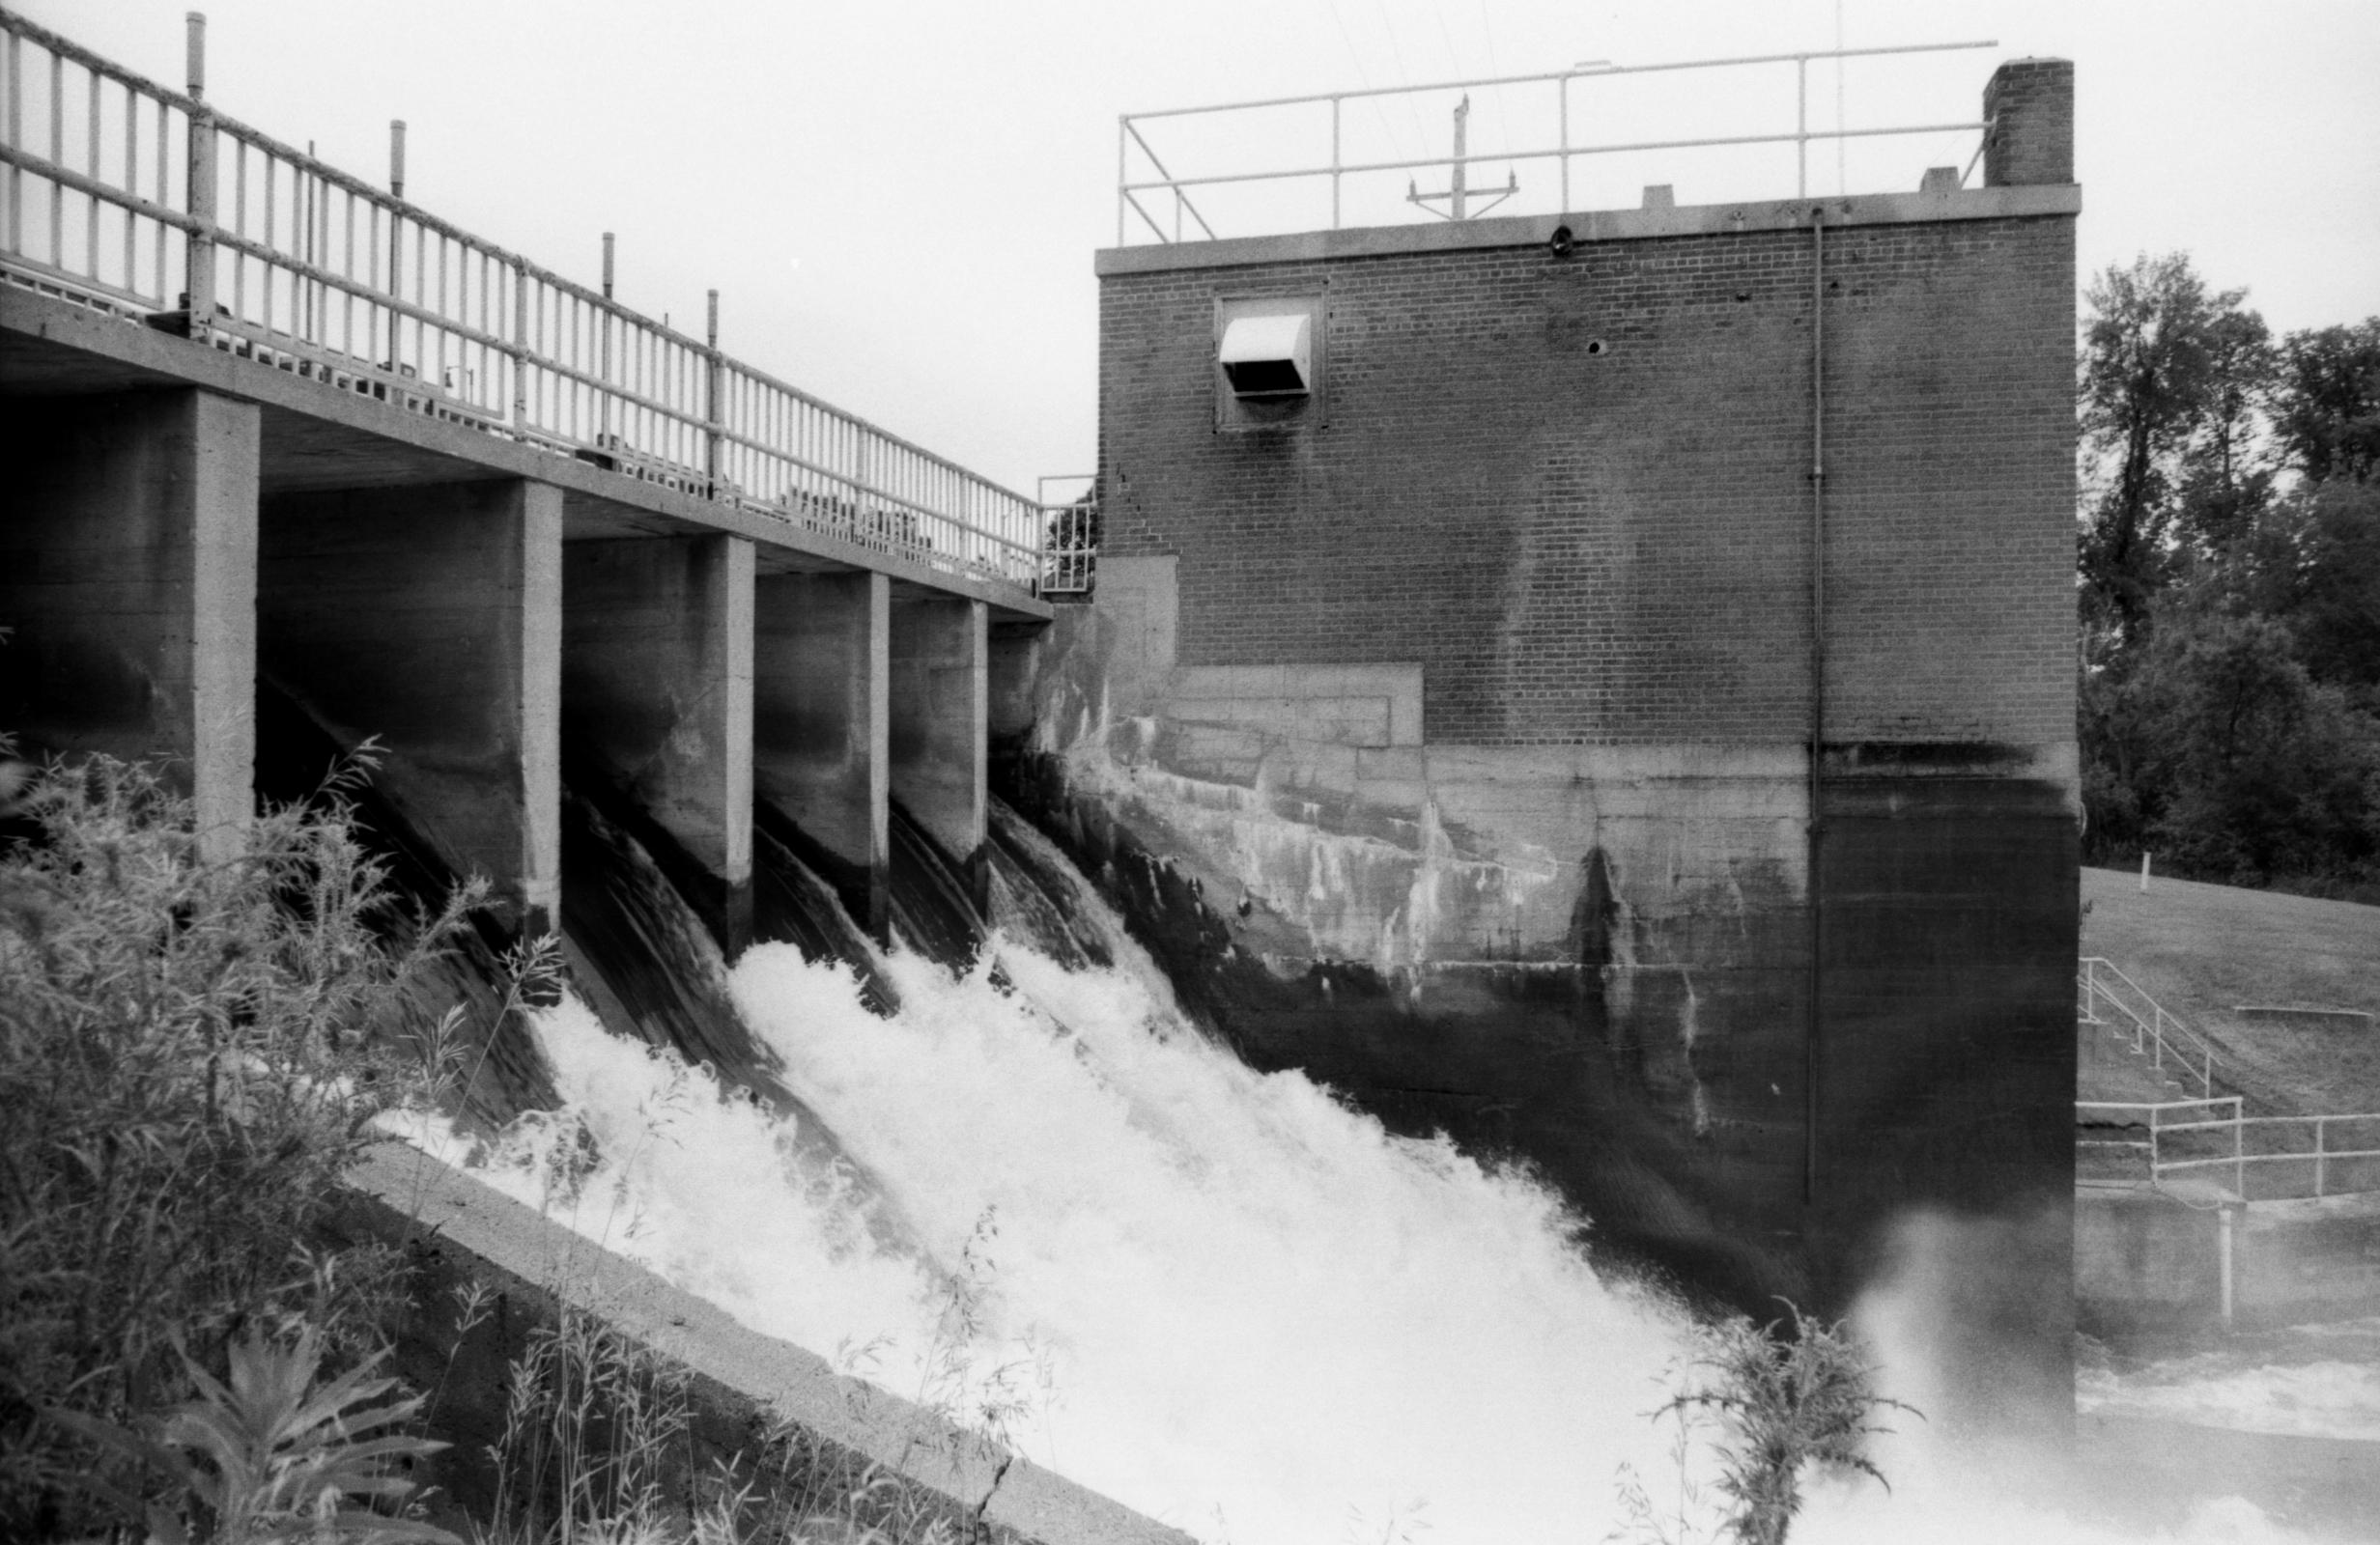 Pisgah Dam and Hydroelectric Plant (1918) Fergus Falls, Minnesota